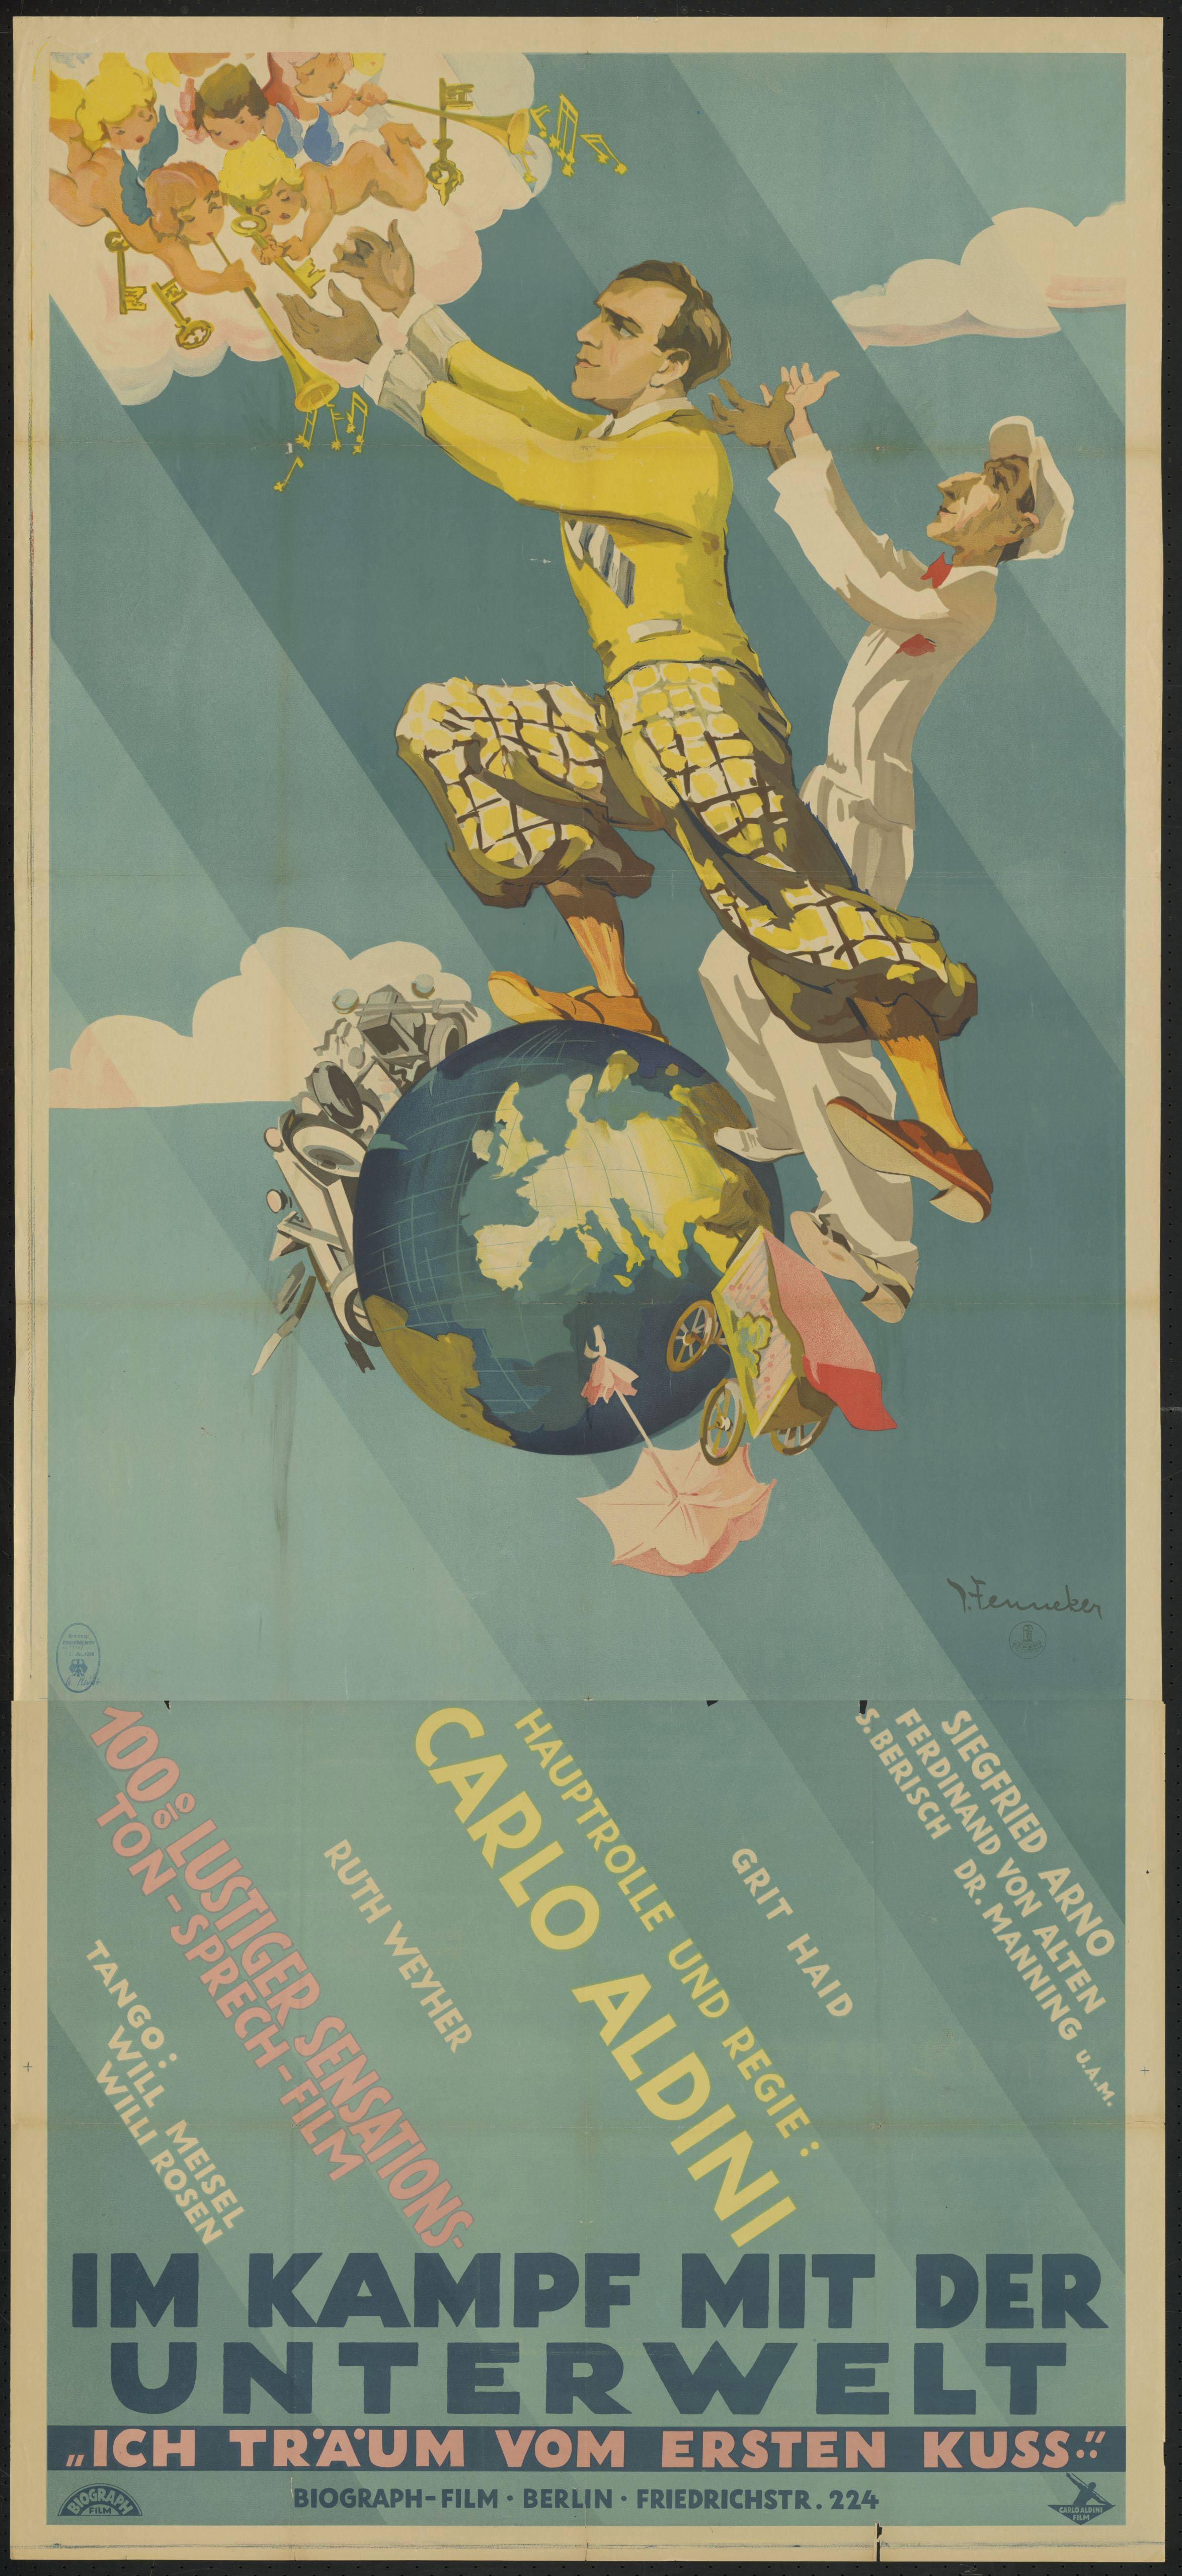 Film poster by Josef Fenneker: Im Kampf mit der Unterwelt, Germany 1930, directed by Carlo Aldini